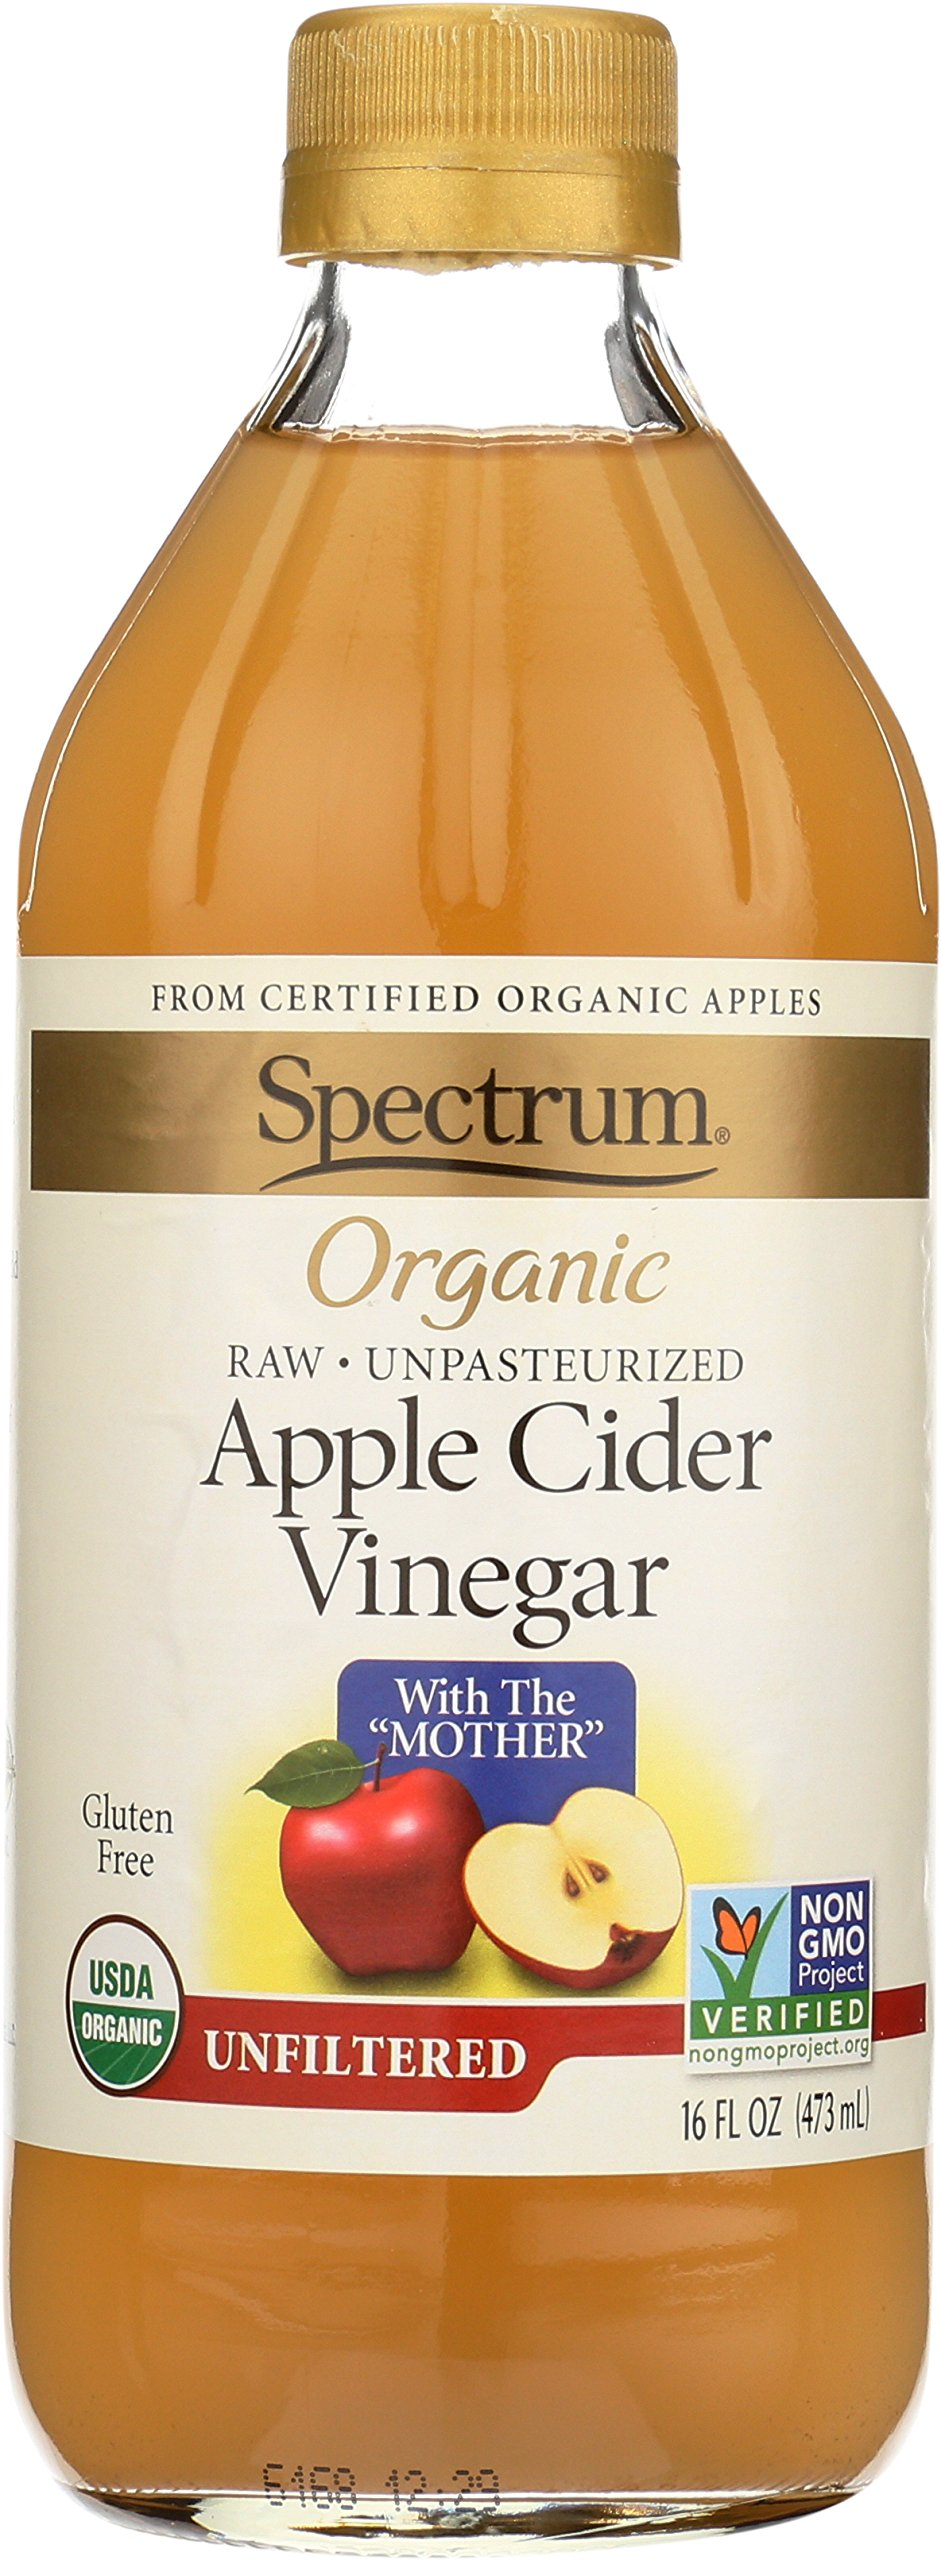 Spectrum, Apple Cider Vinegar, Organic, Unfiltered, 16 oz